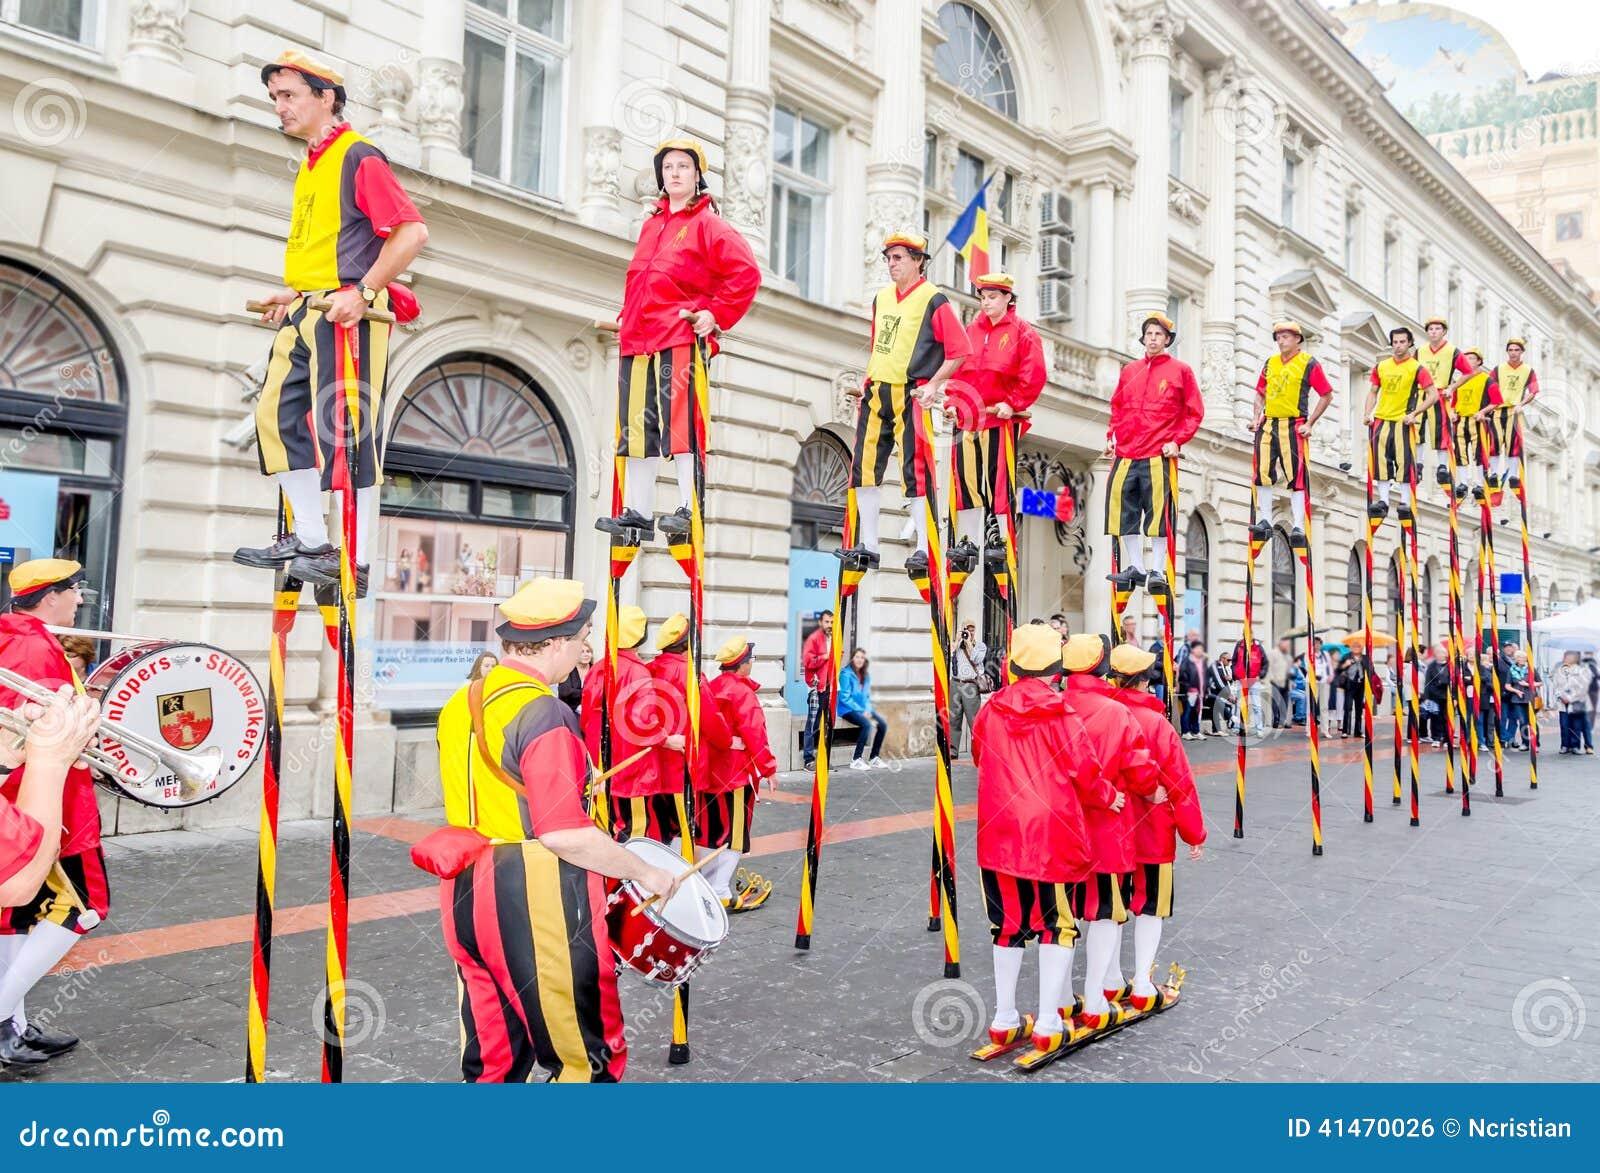 International Street Theatre Company - Steltlopers Merchtem Belgium, Stiltwalkers.